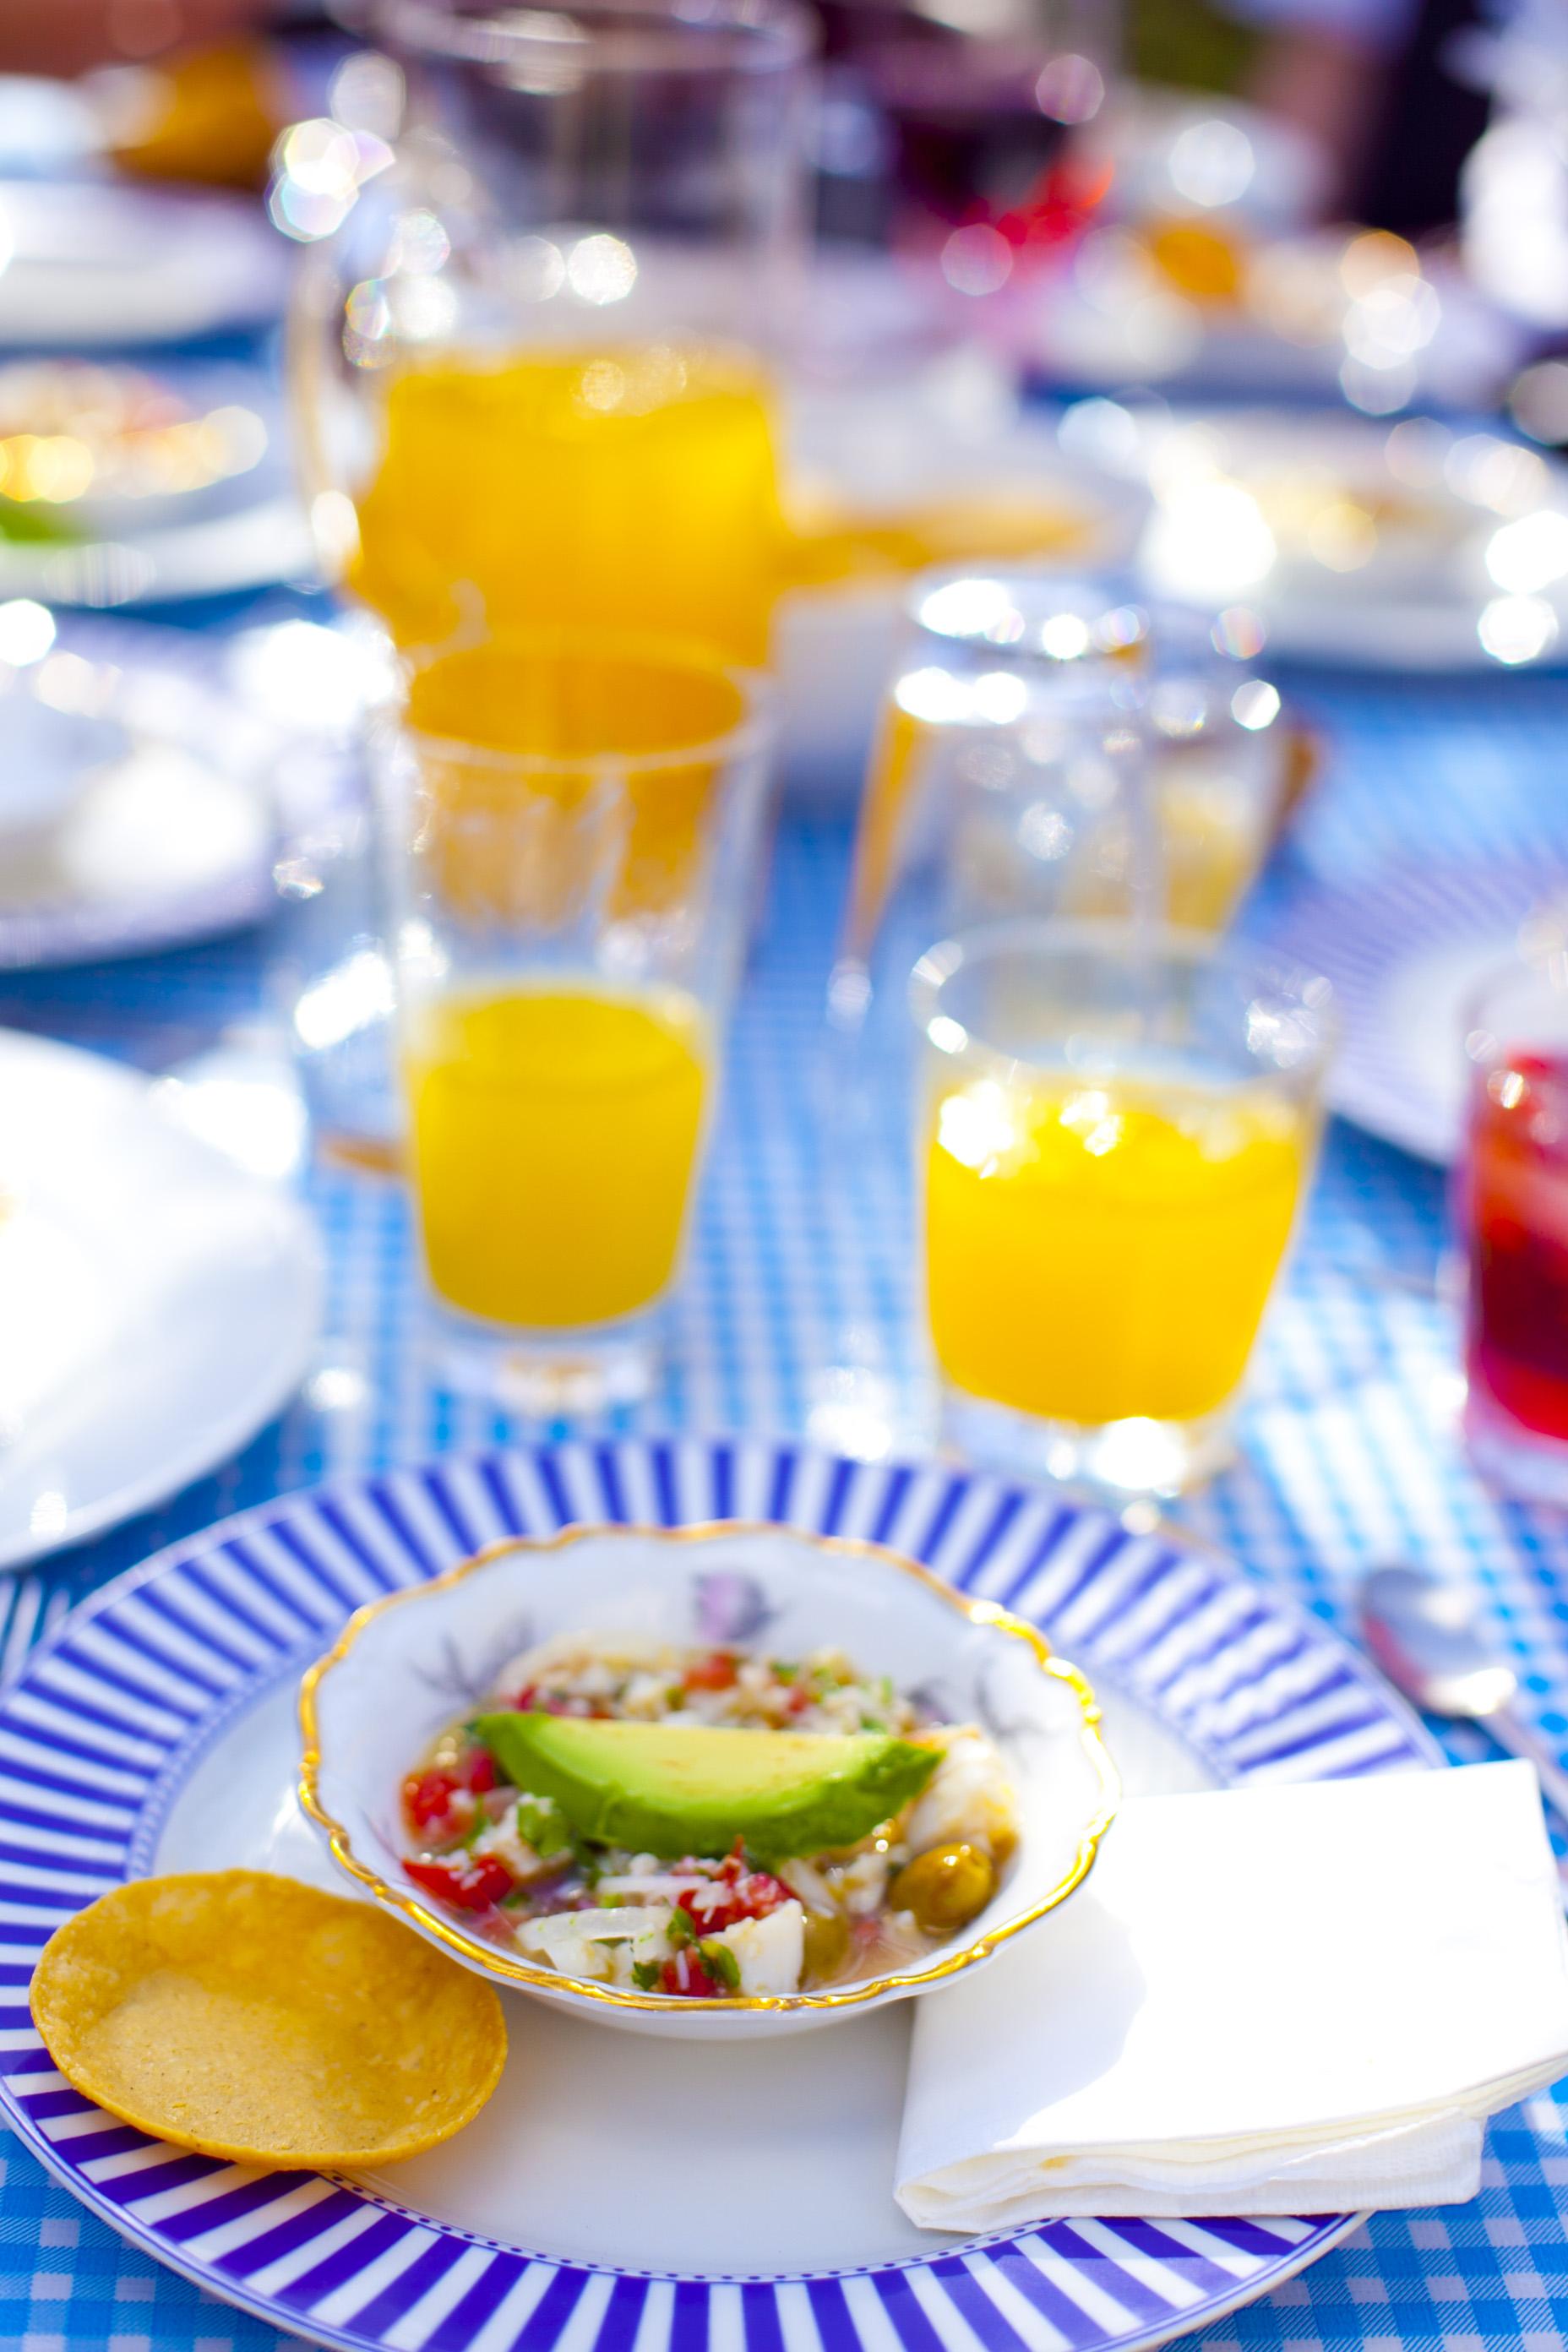 Ceviche Tostadas with fresh orange juice